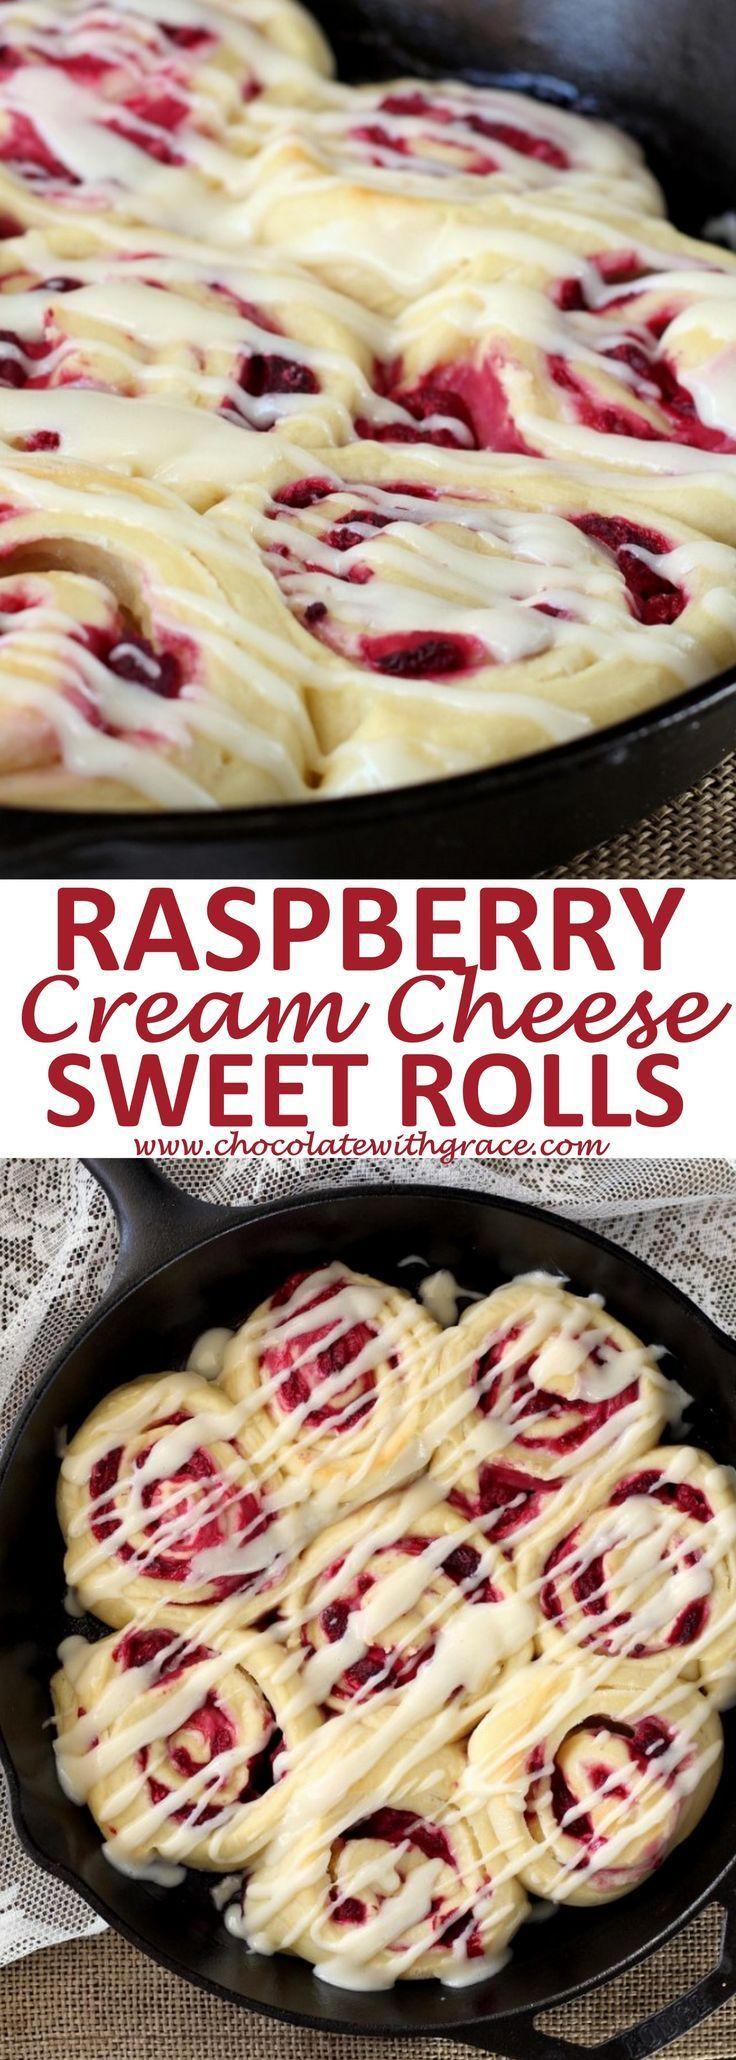 Raspberry Cream Cheese Sweet Rolls l Christmas brunch recipe